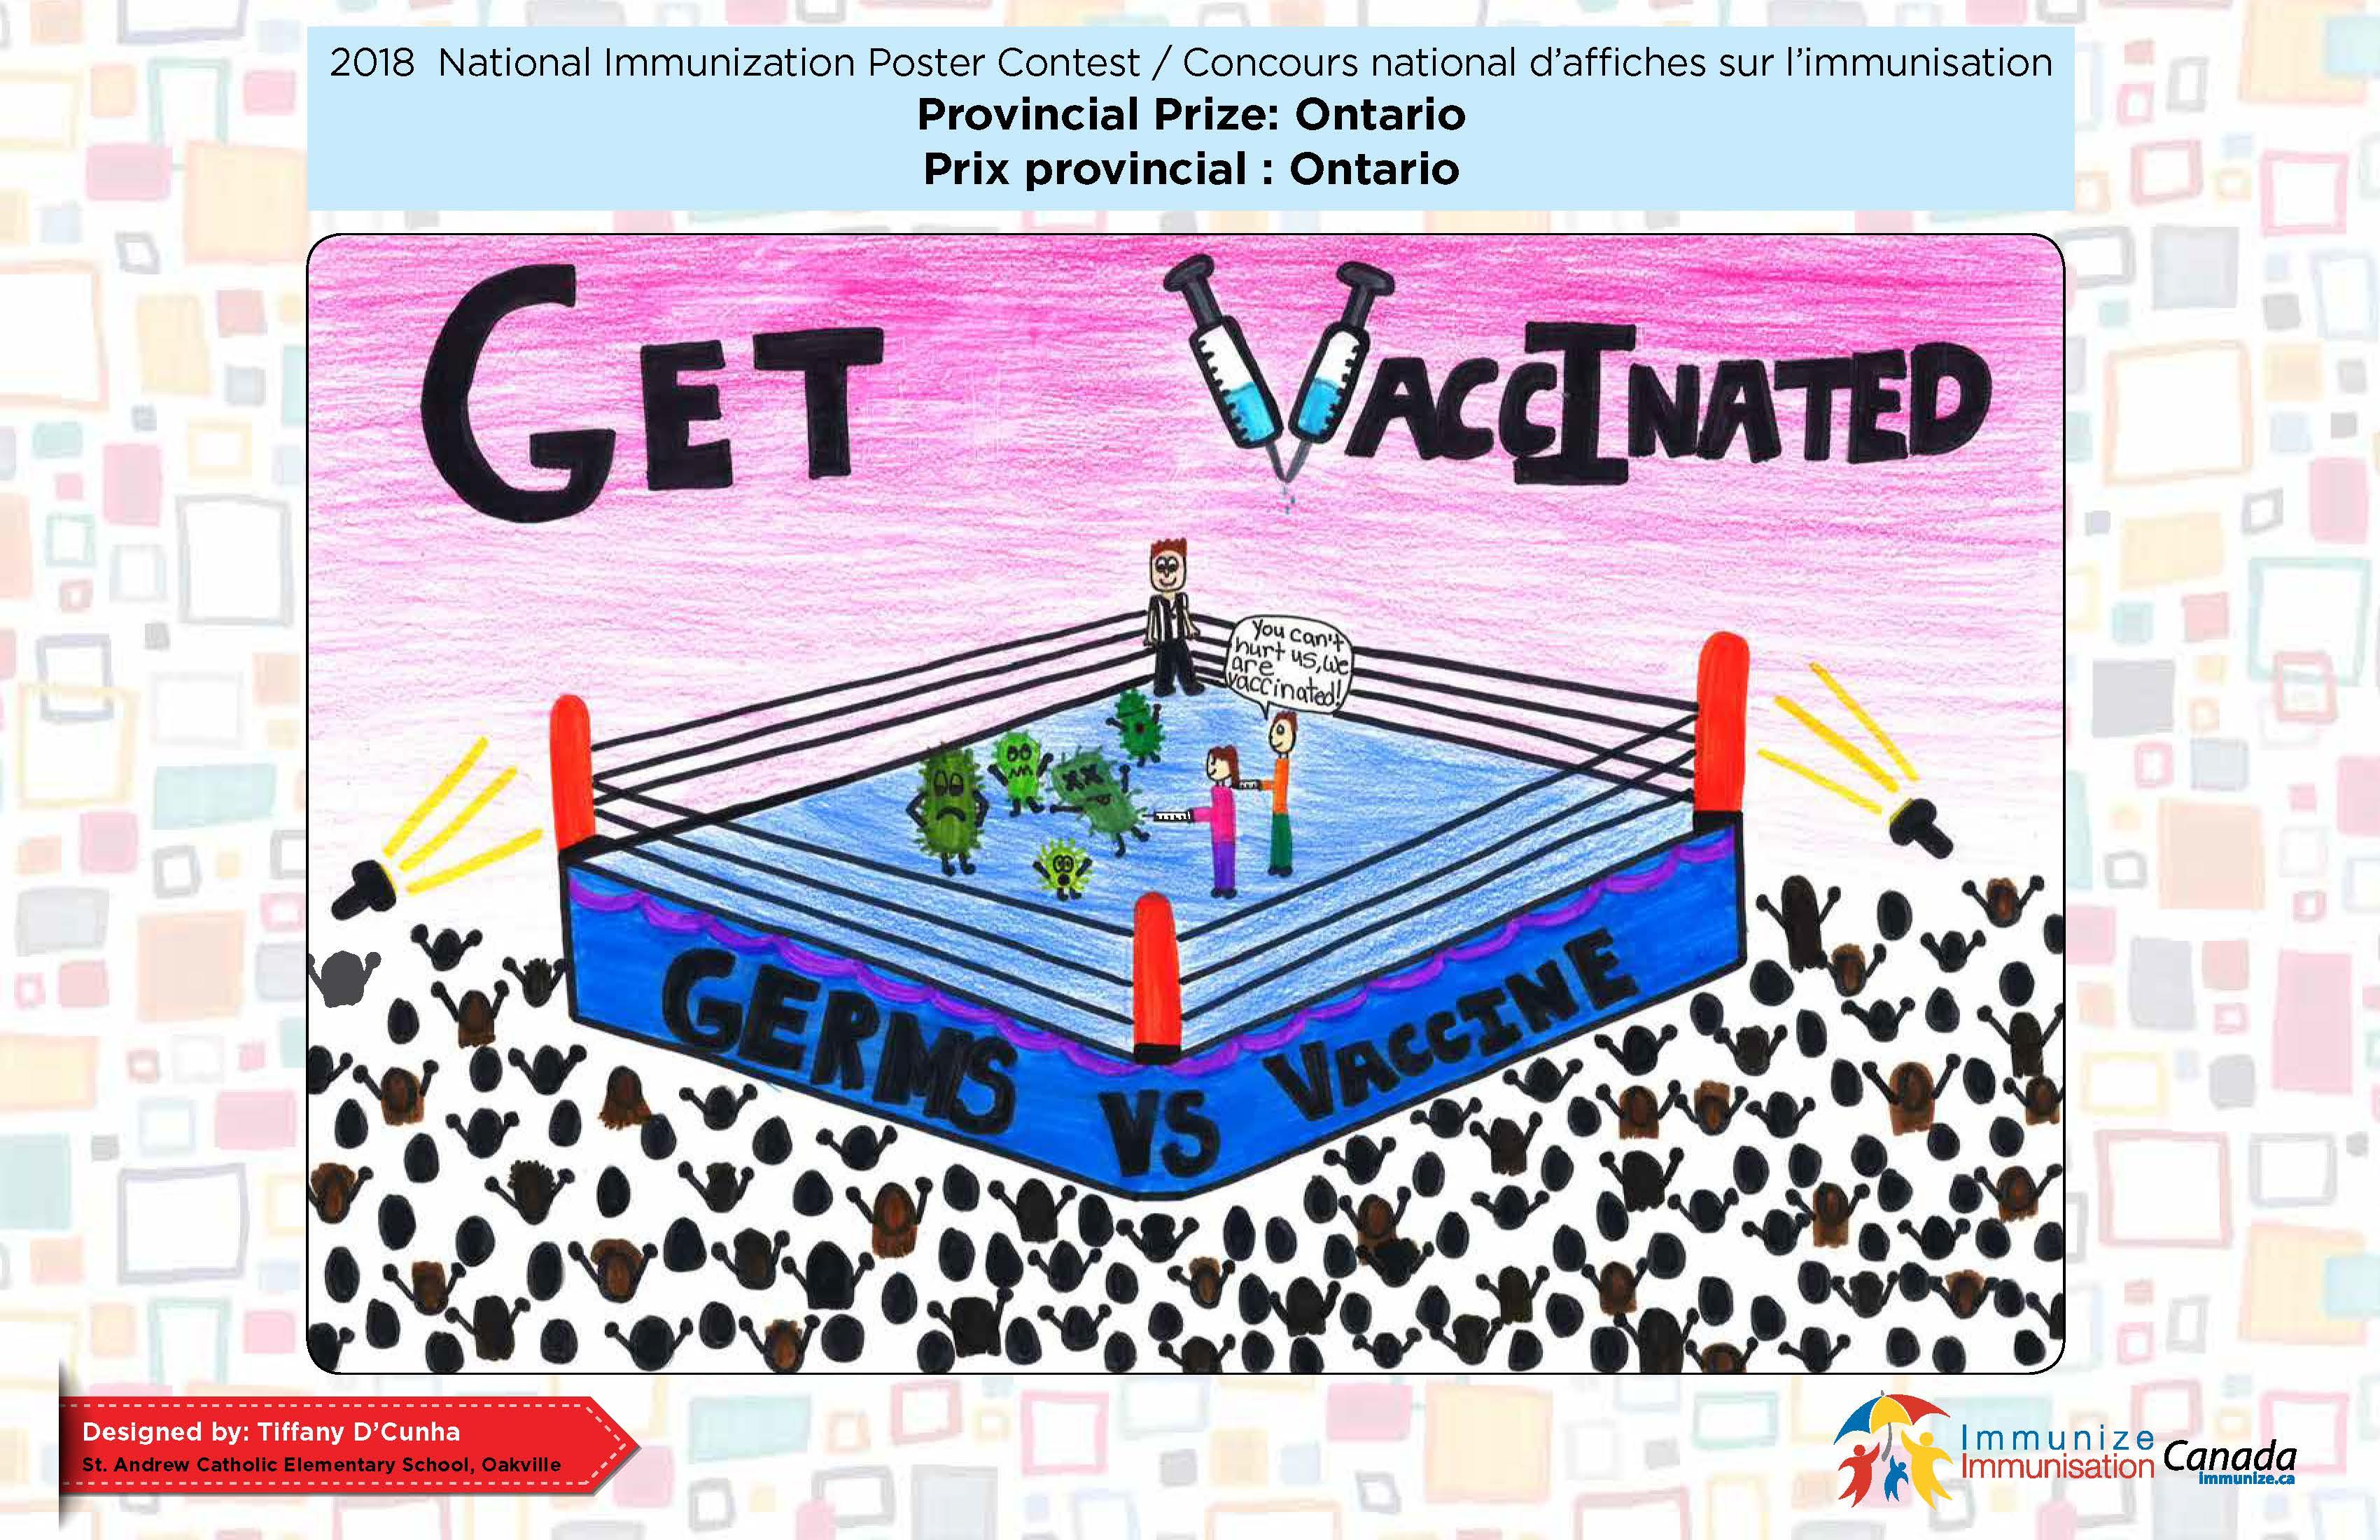 National Immunization Poster Contest | immunizecanada